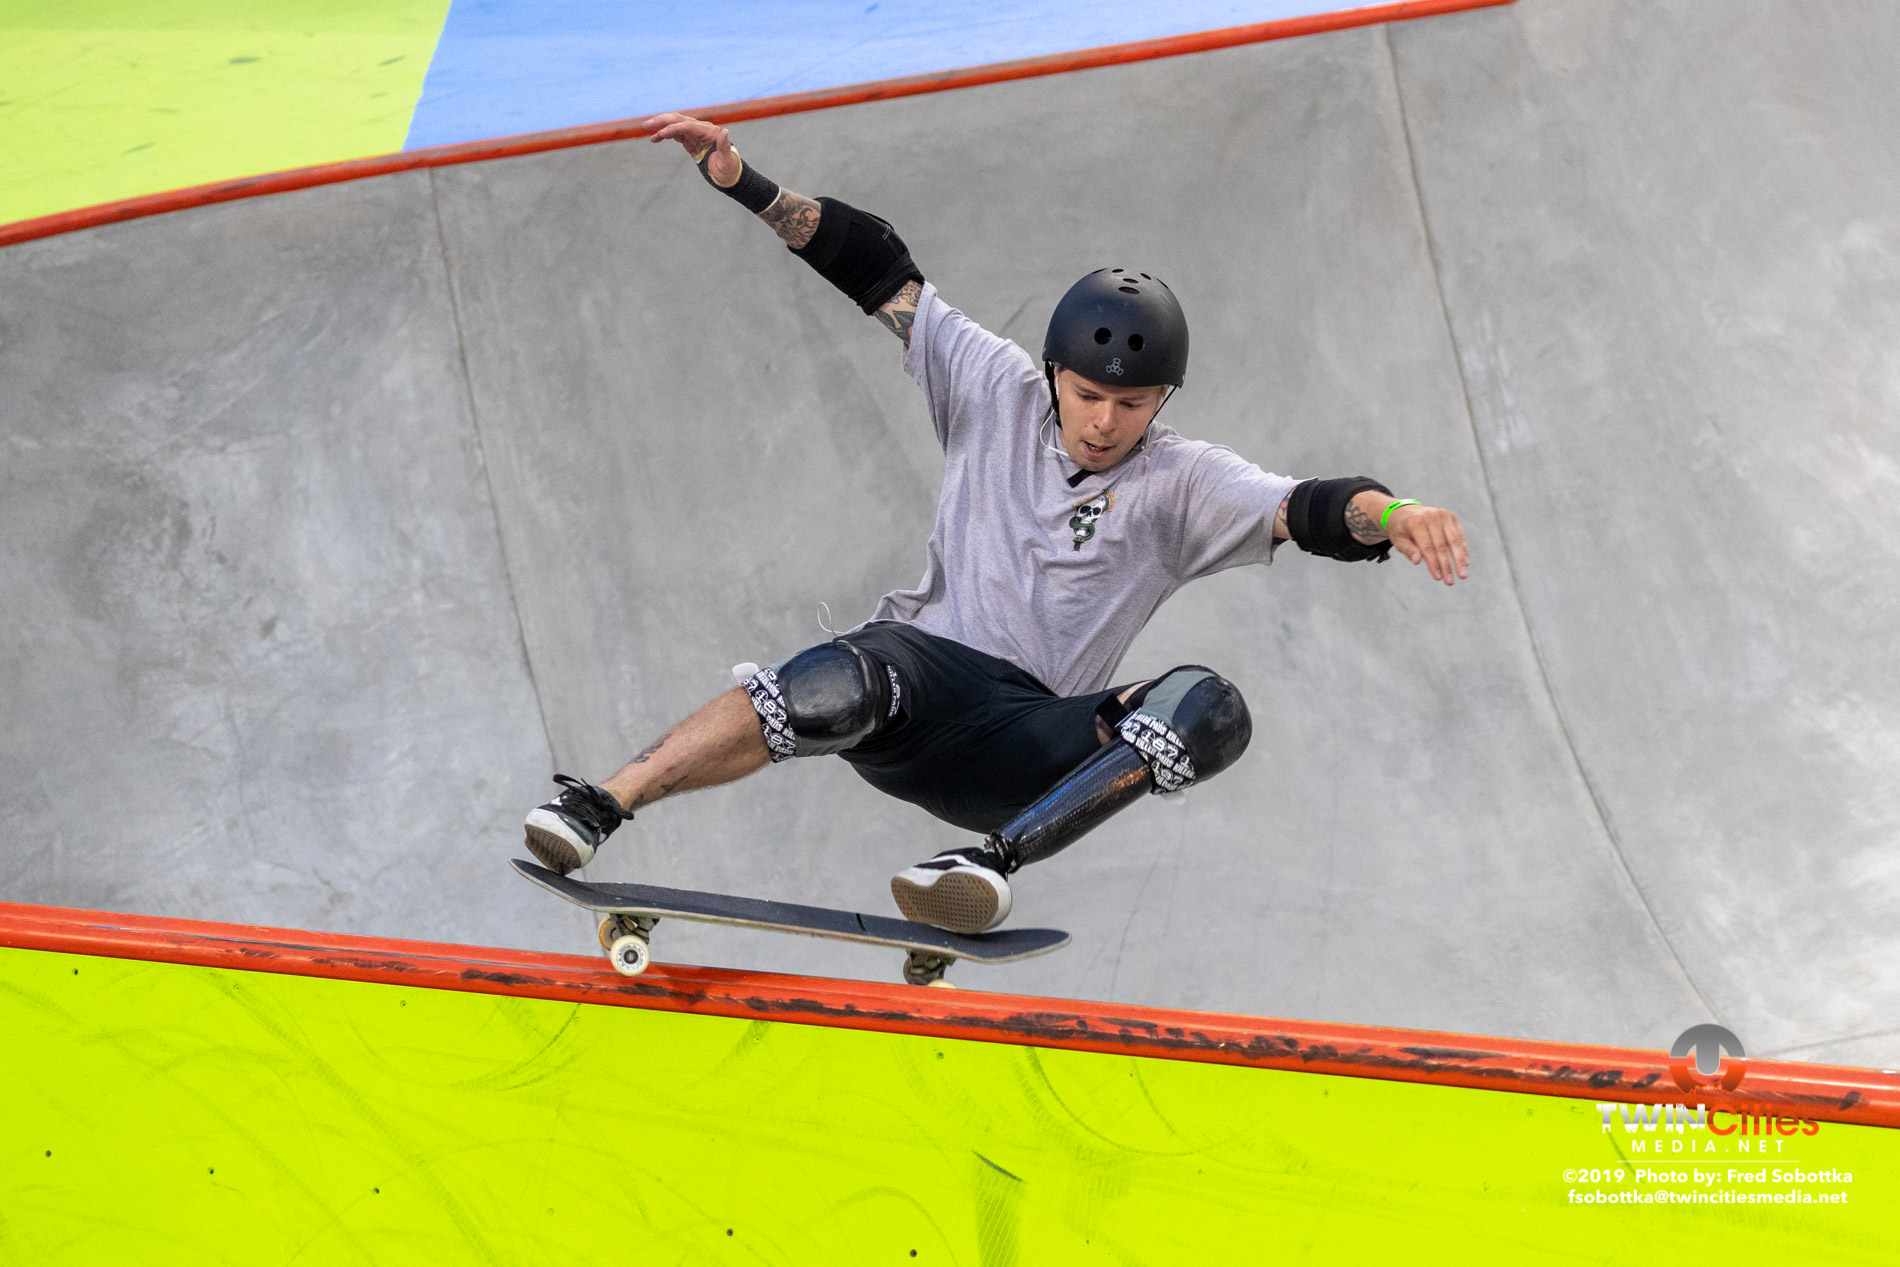 Adaptive-Skateboard-Park-07